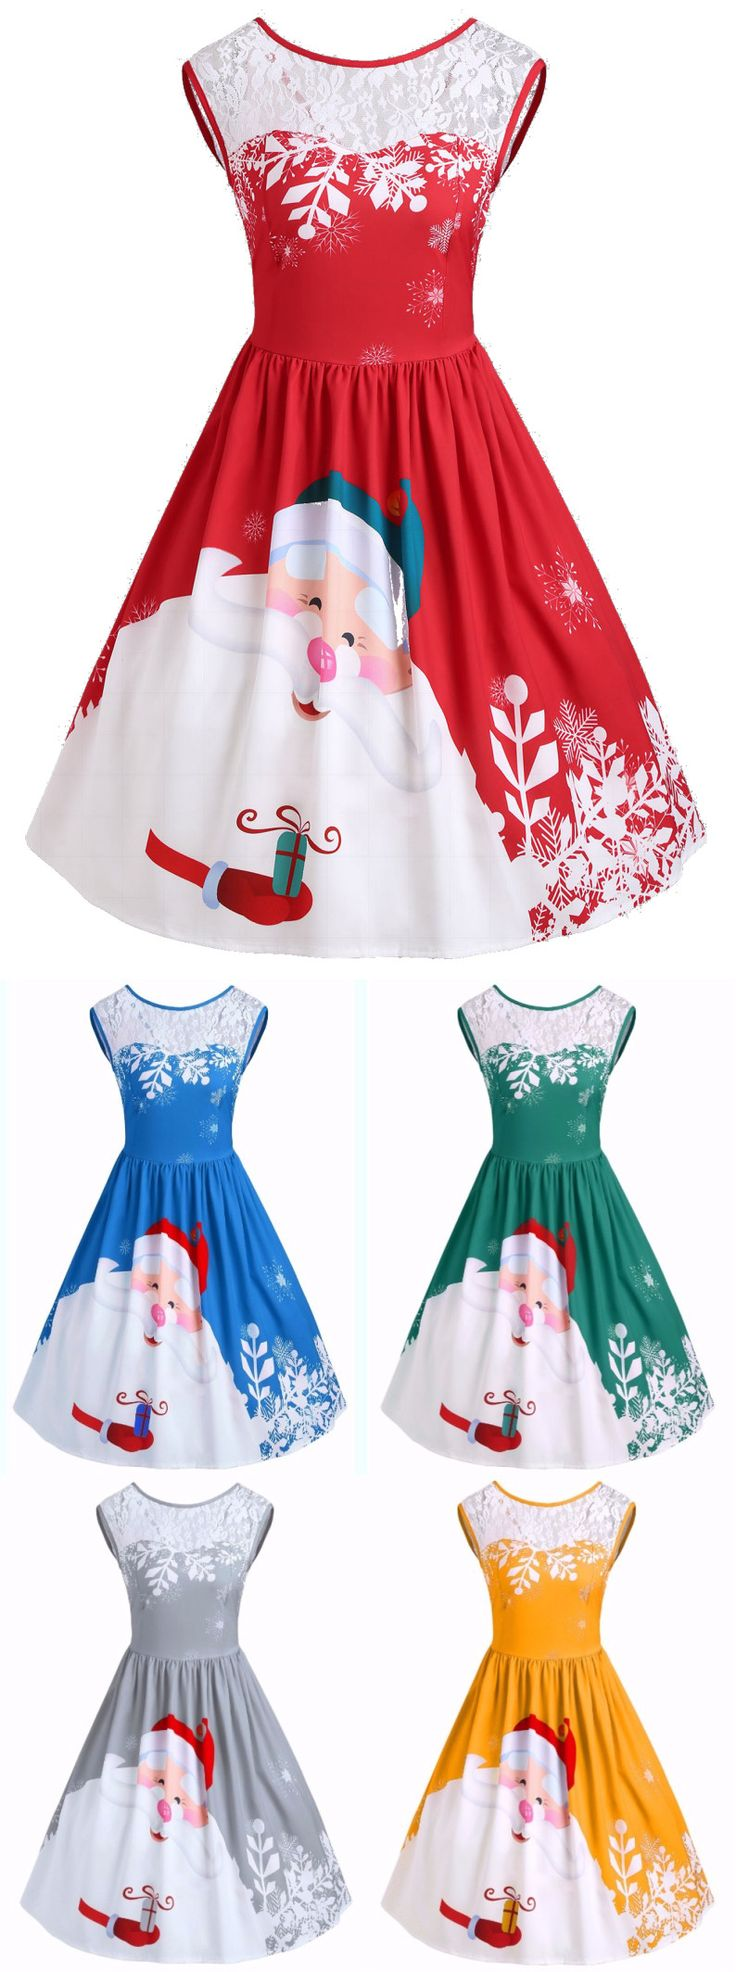 Merry Christmas | Only $13.44  | Santa Claus Print Party Dress | Sammydress.com